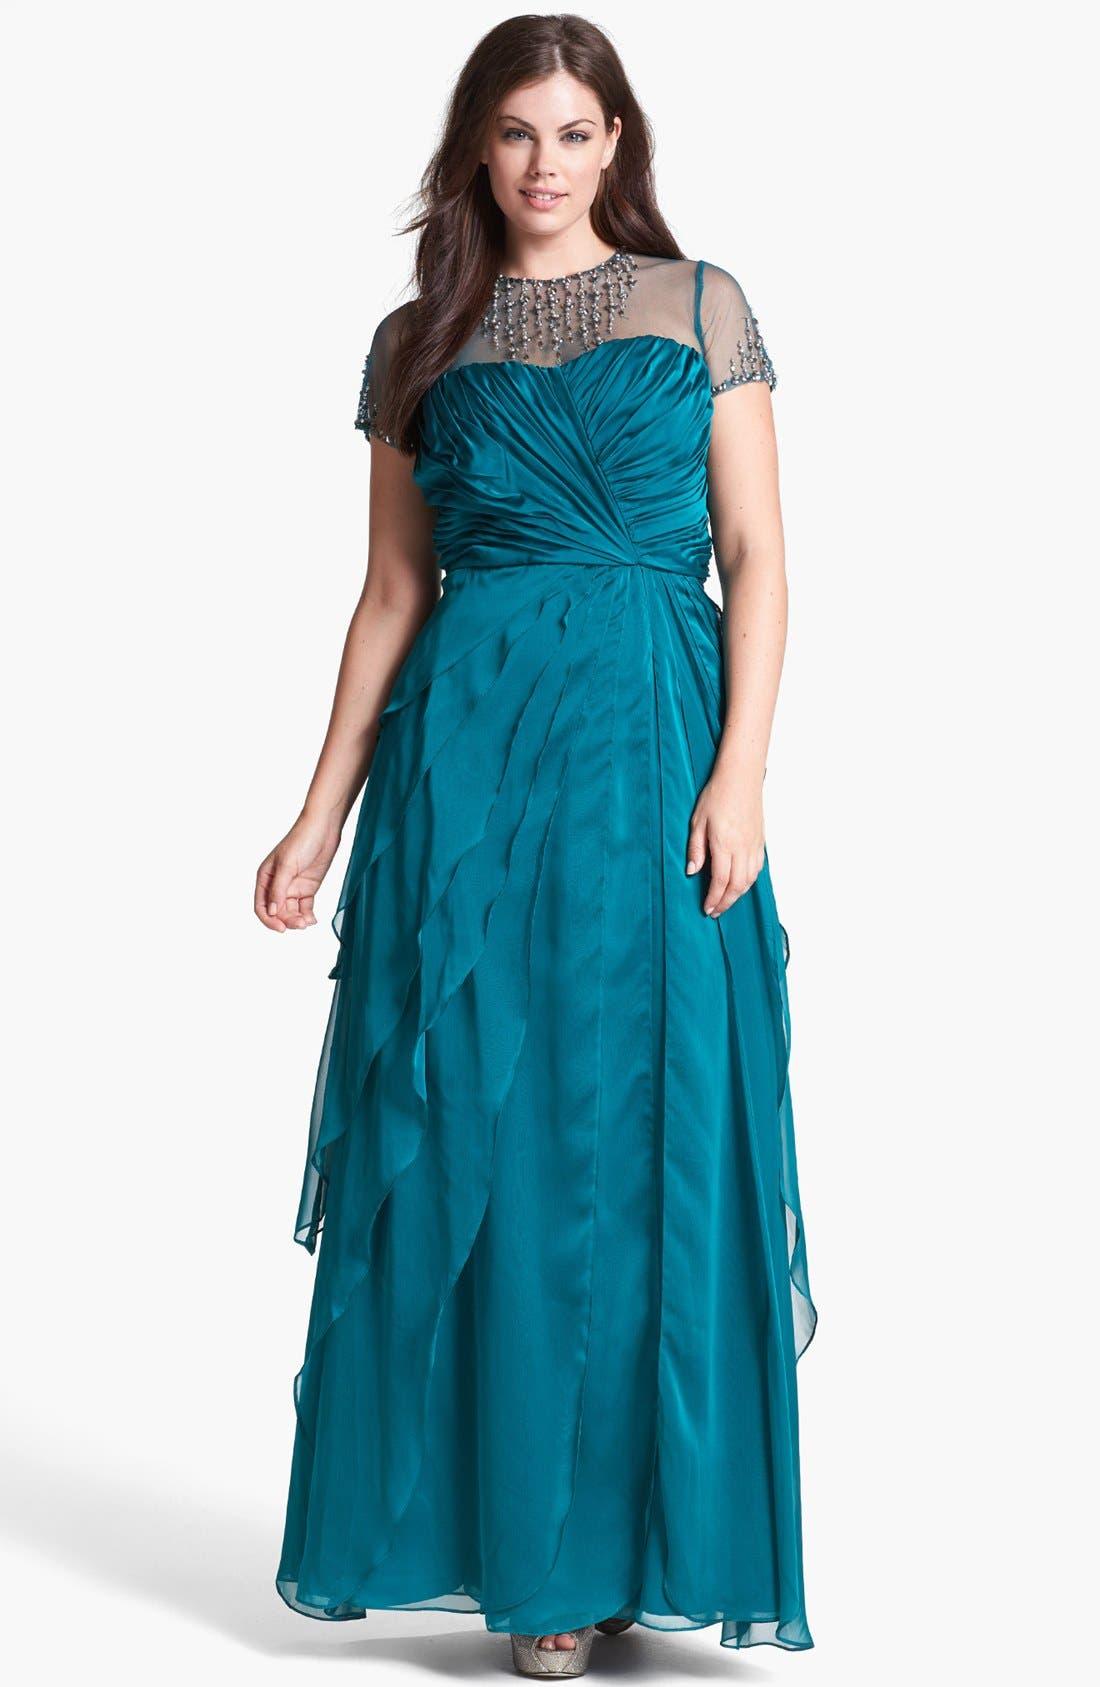 Alternate Image 1 Selected - Adrianna Papell Embellished Yoke Ruffled Charmeuse Gown (Plus Size)